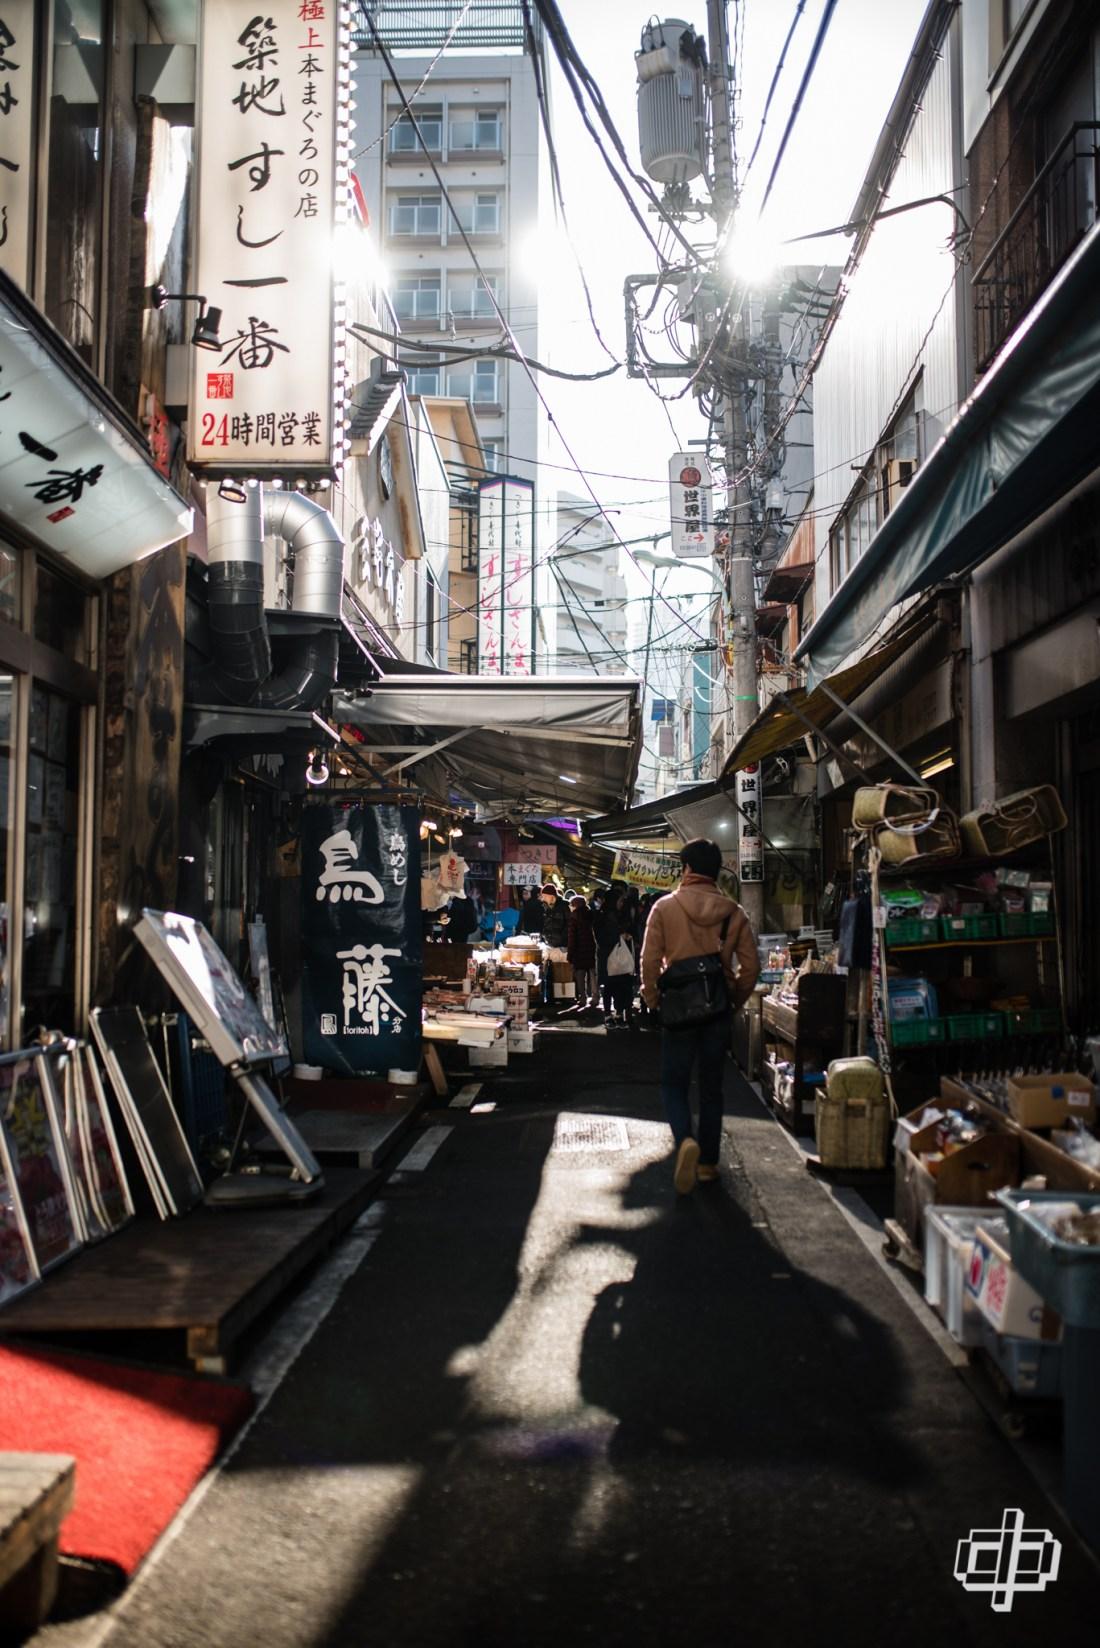 tsukiji fish market journey to tokyo 2017 dtphan